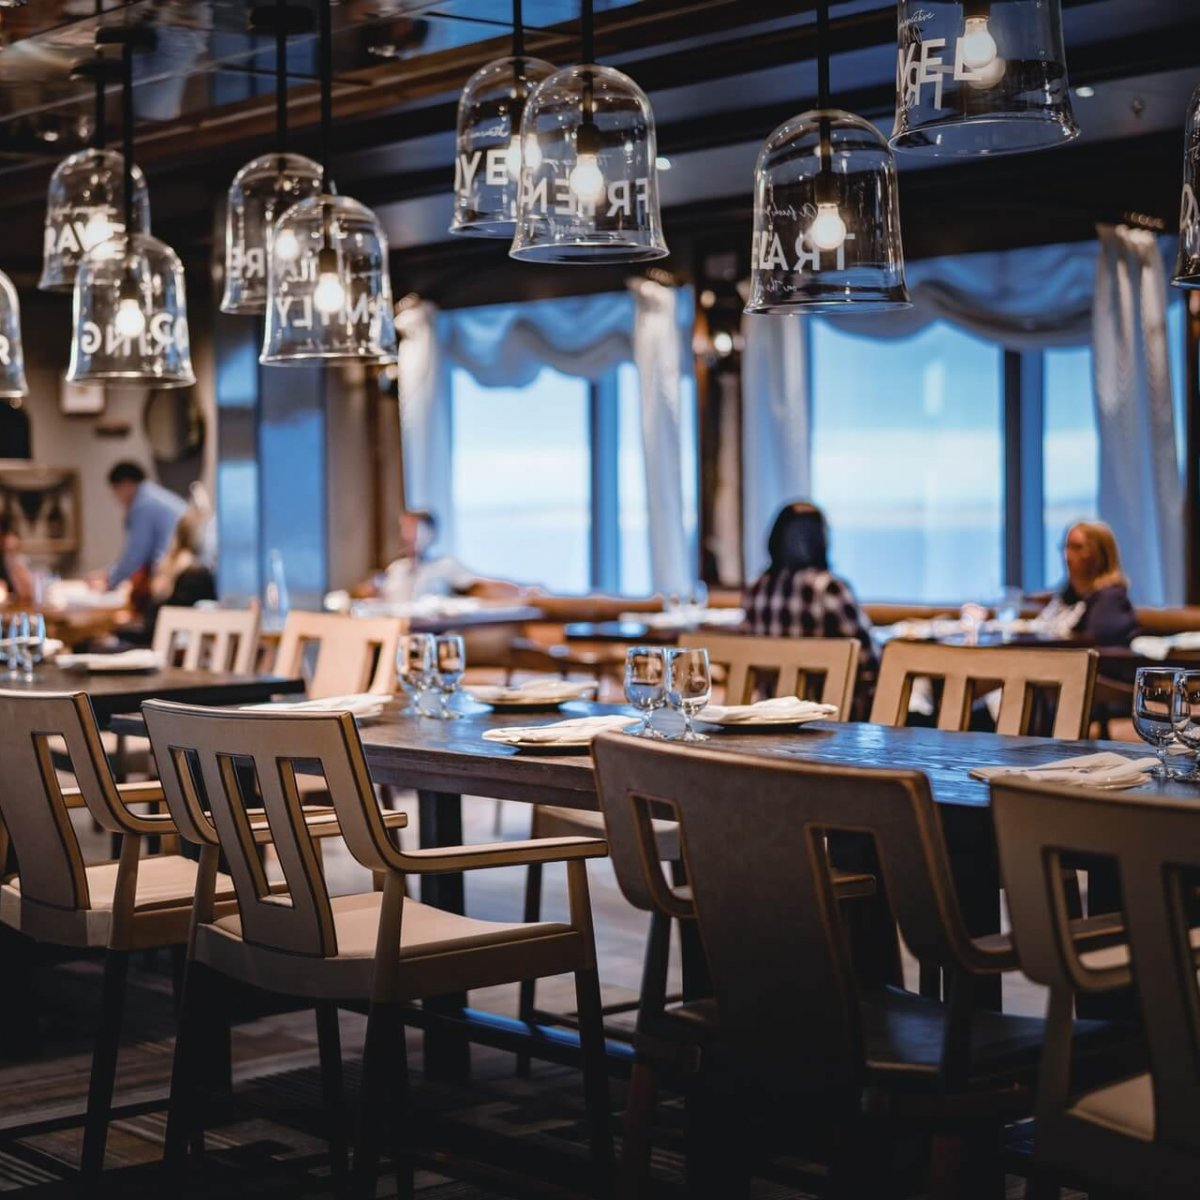 table 17 - National Restaurant Properties